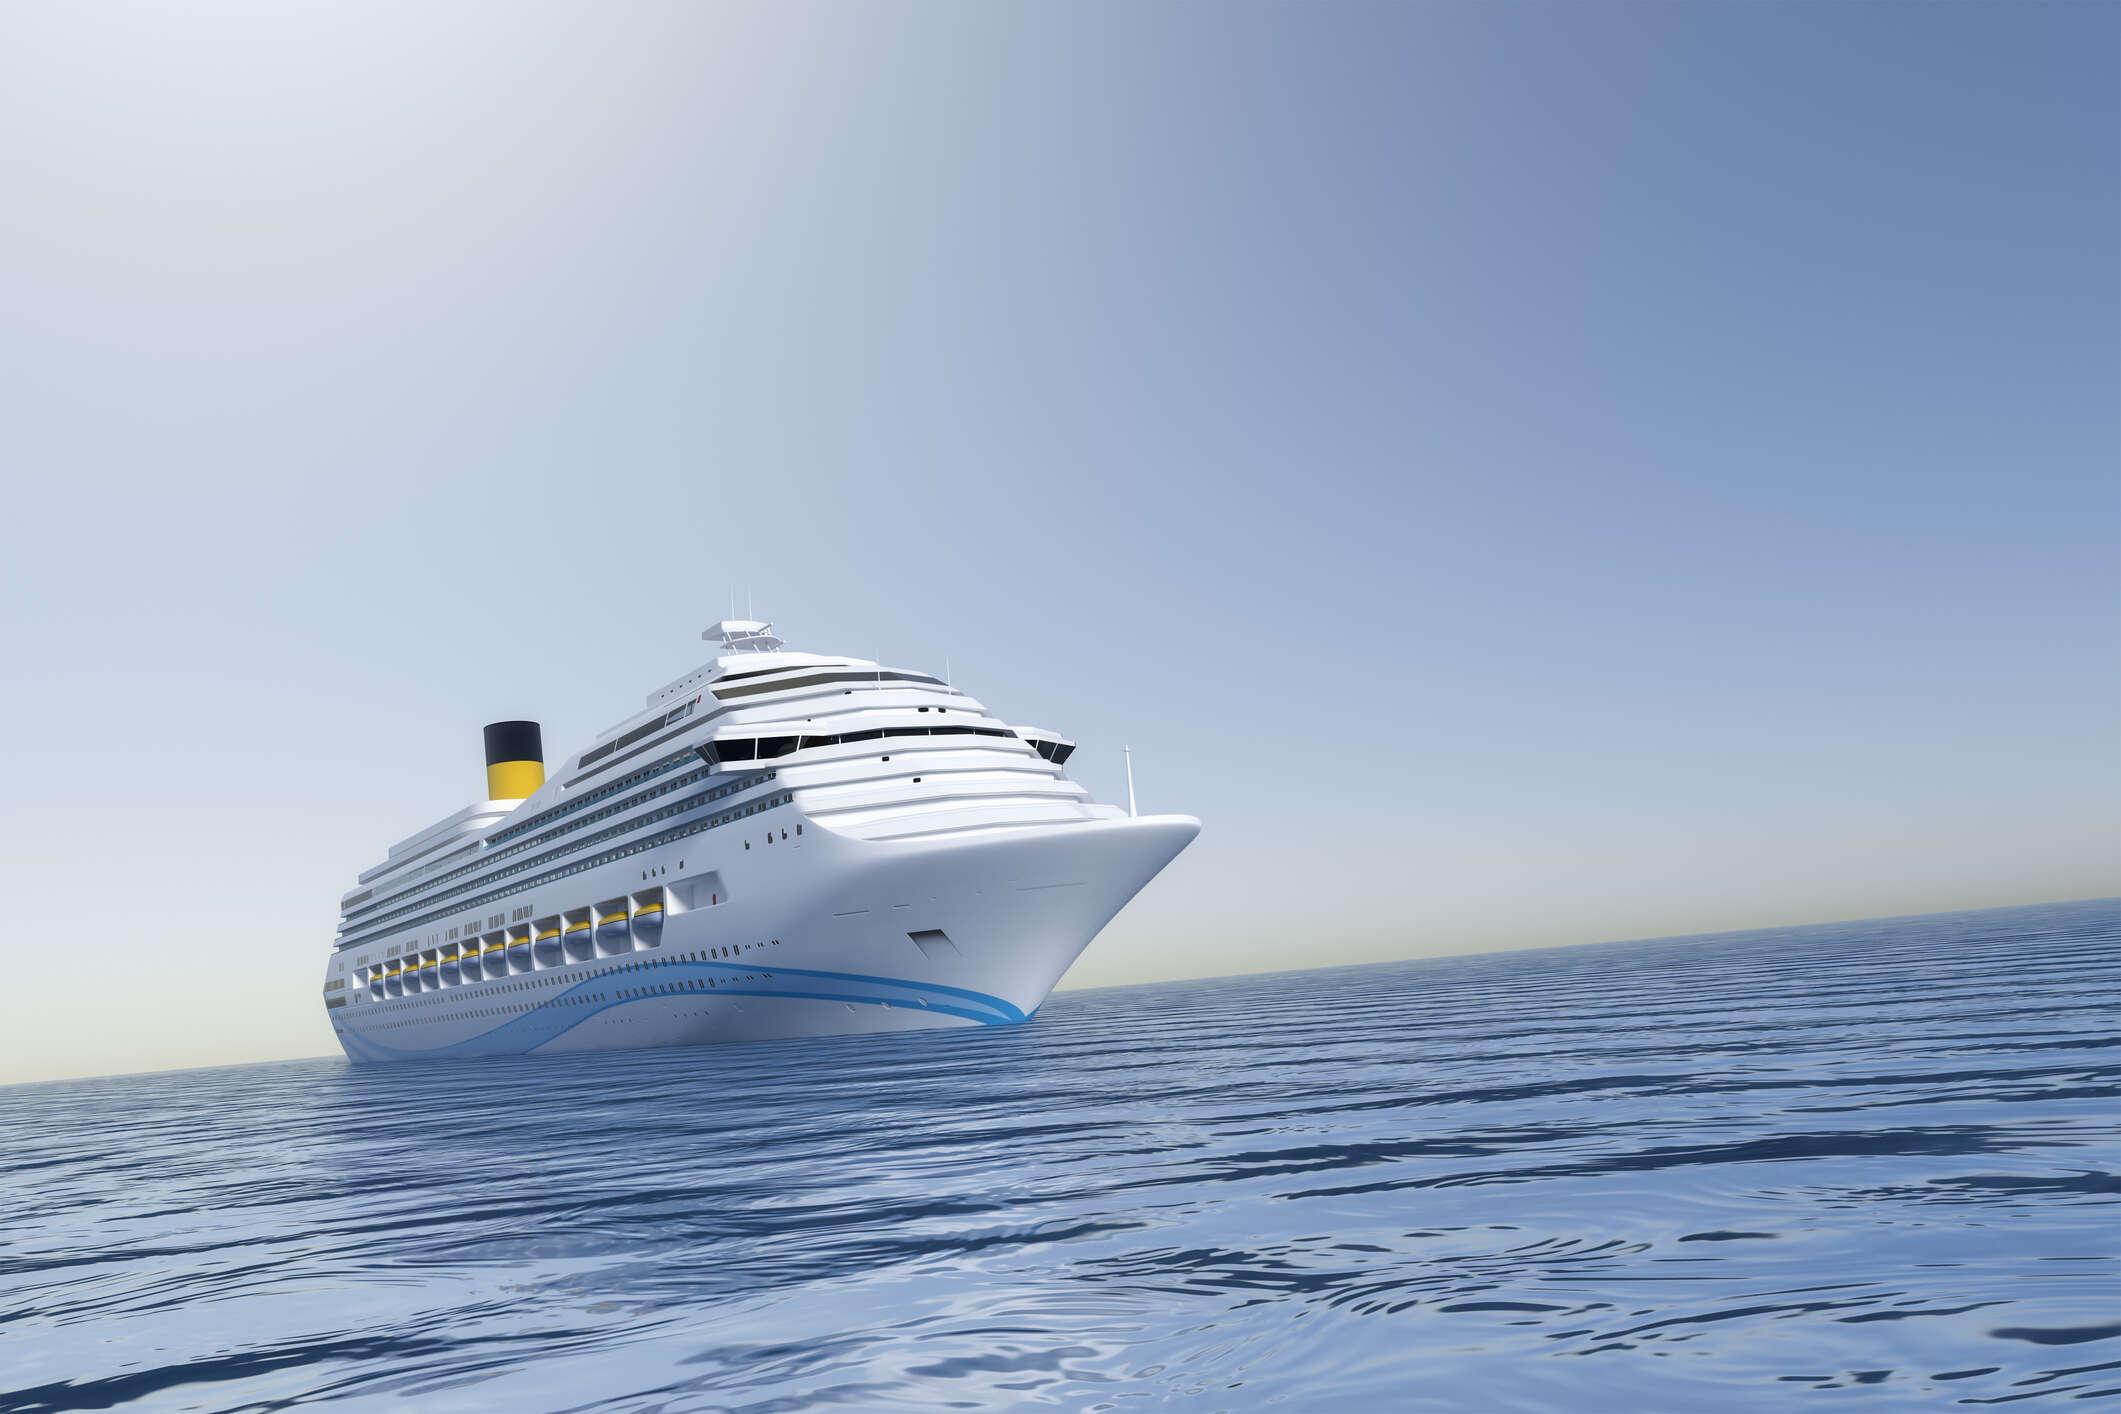 Princess Cruises 3 for Free November